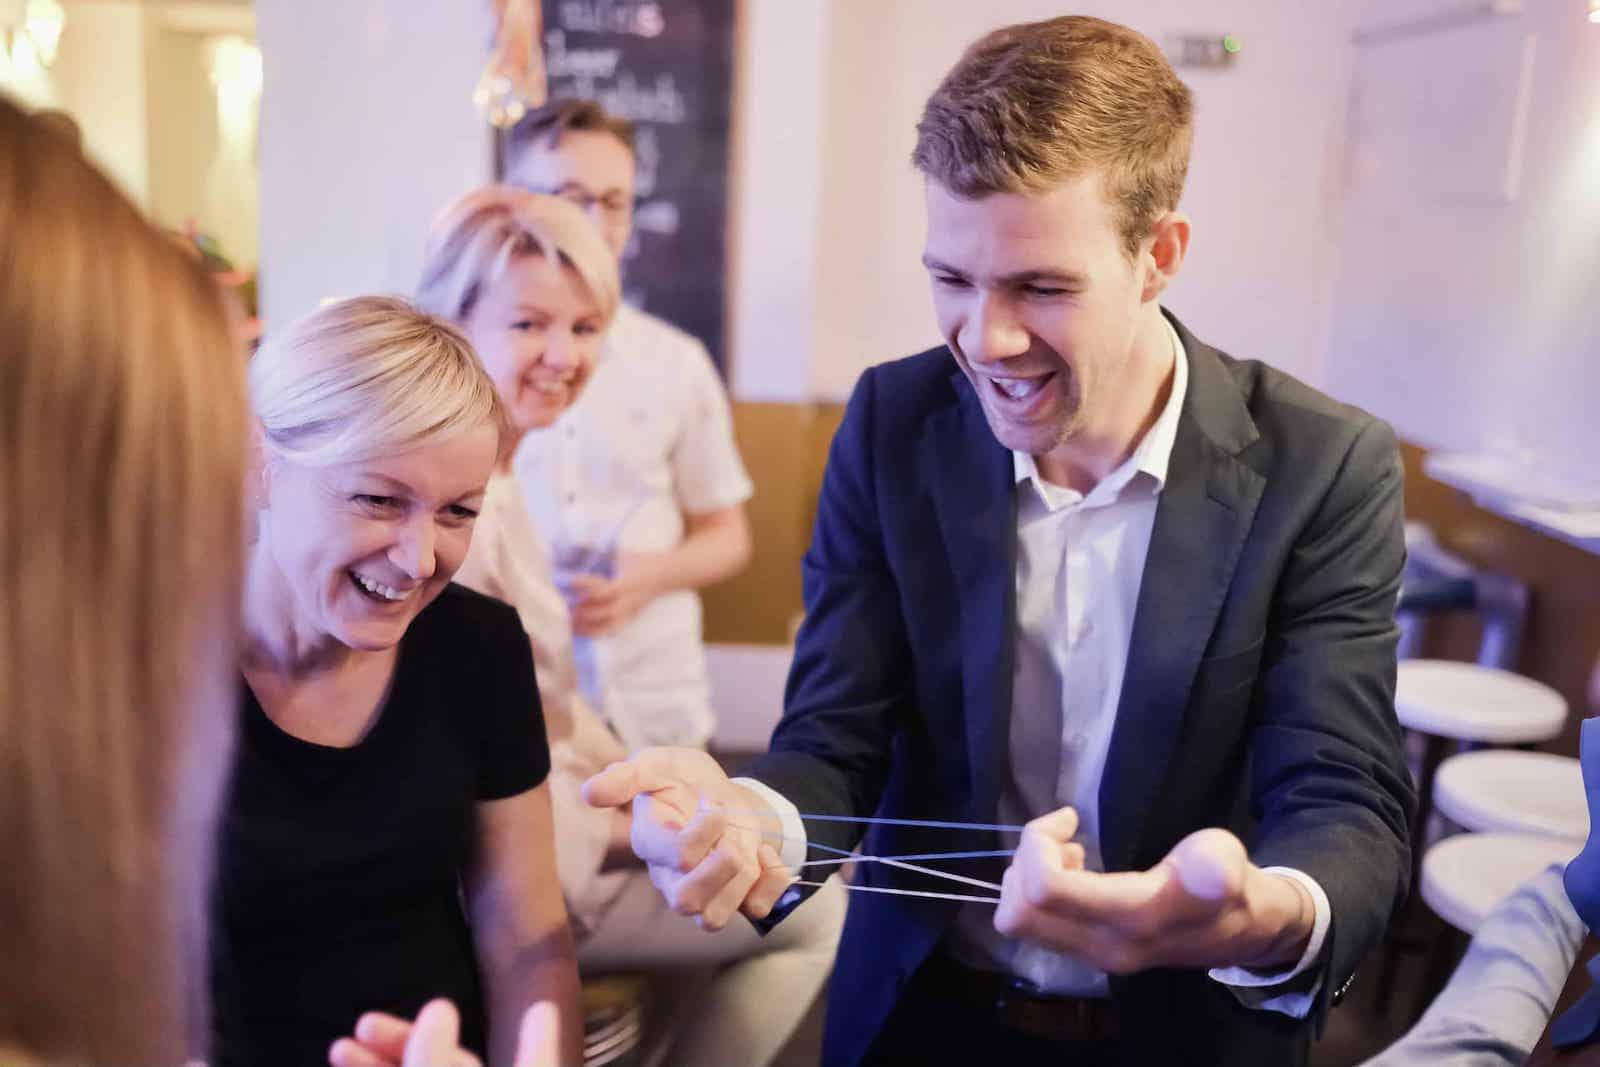 Zauberer Mönchengladbach mit Publikum beim zaubern